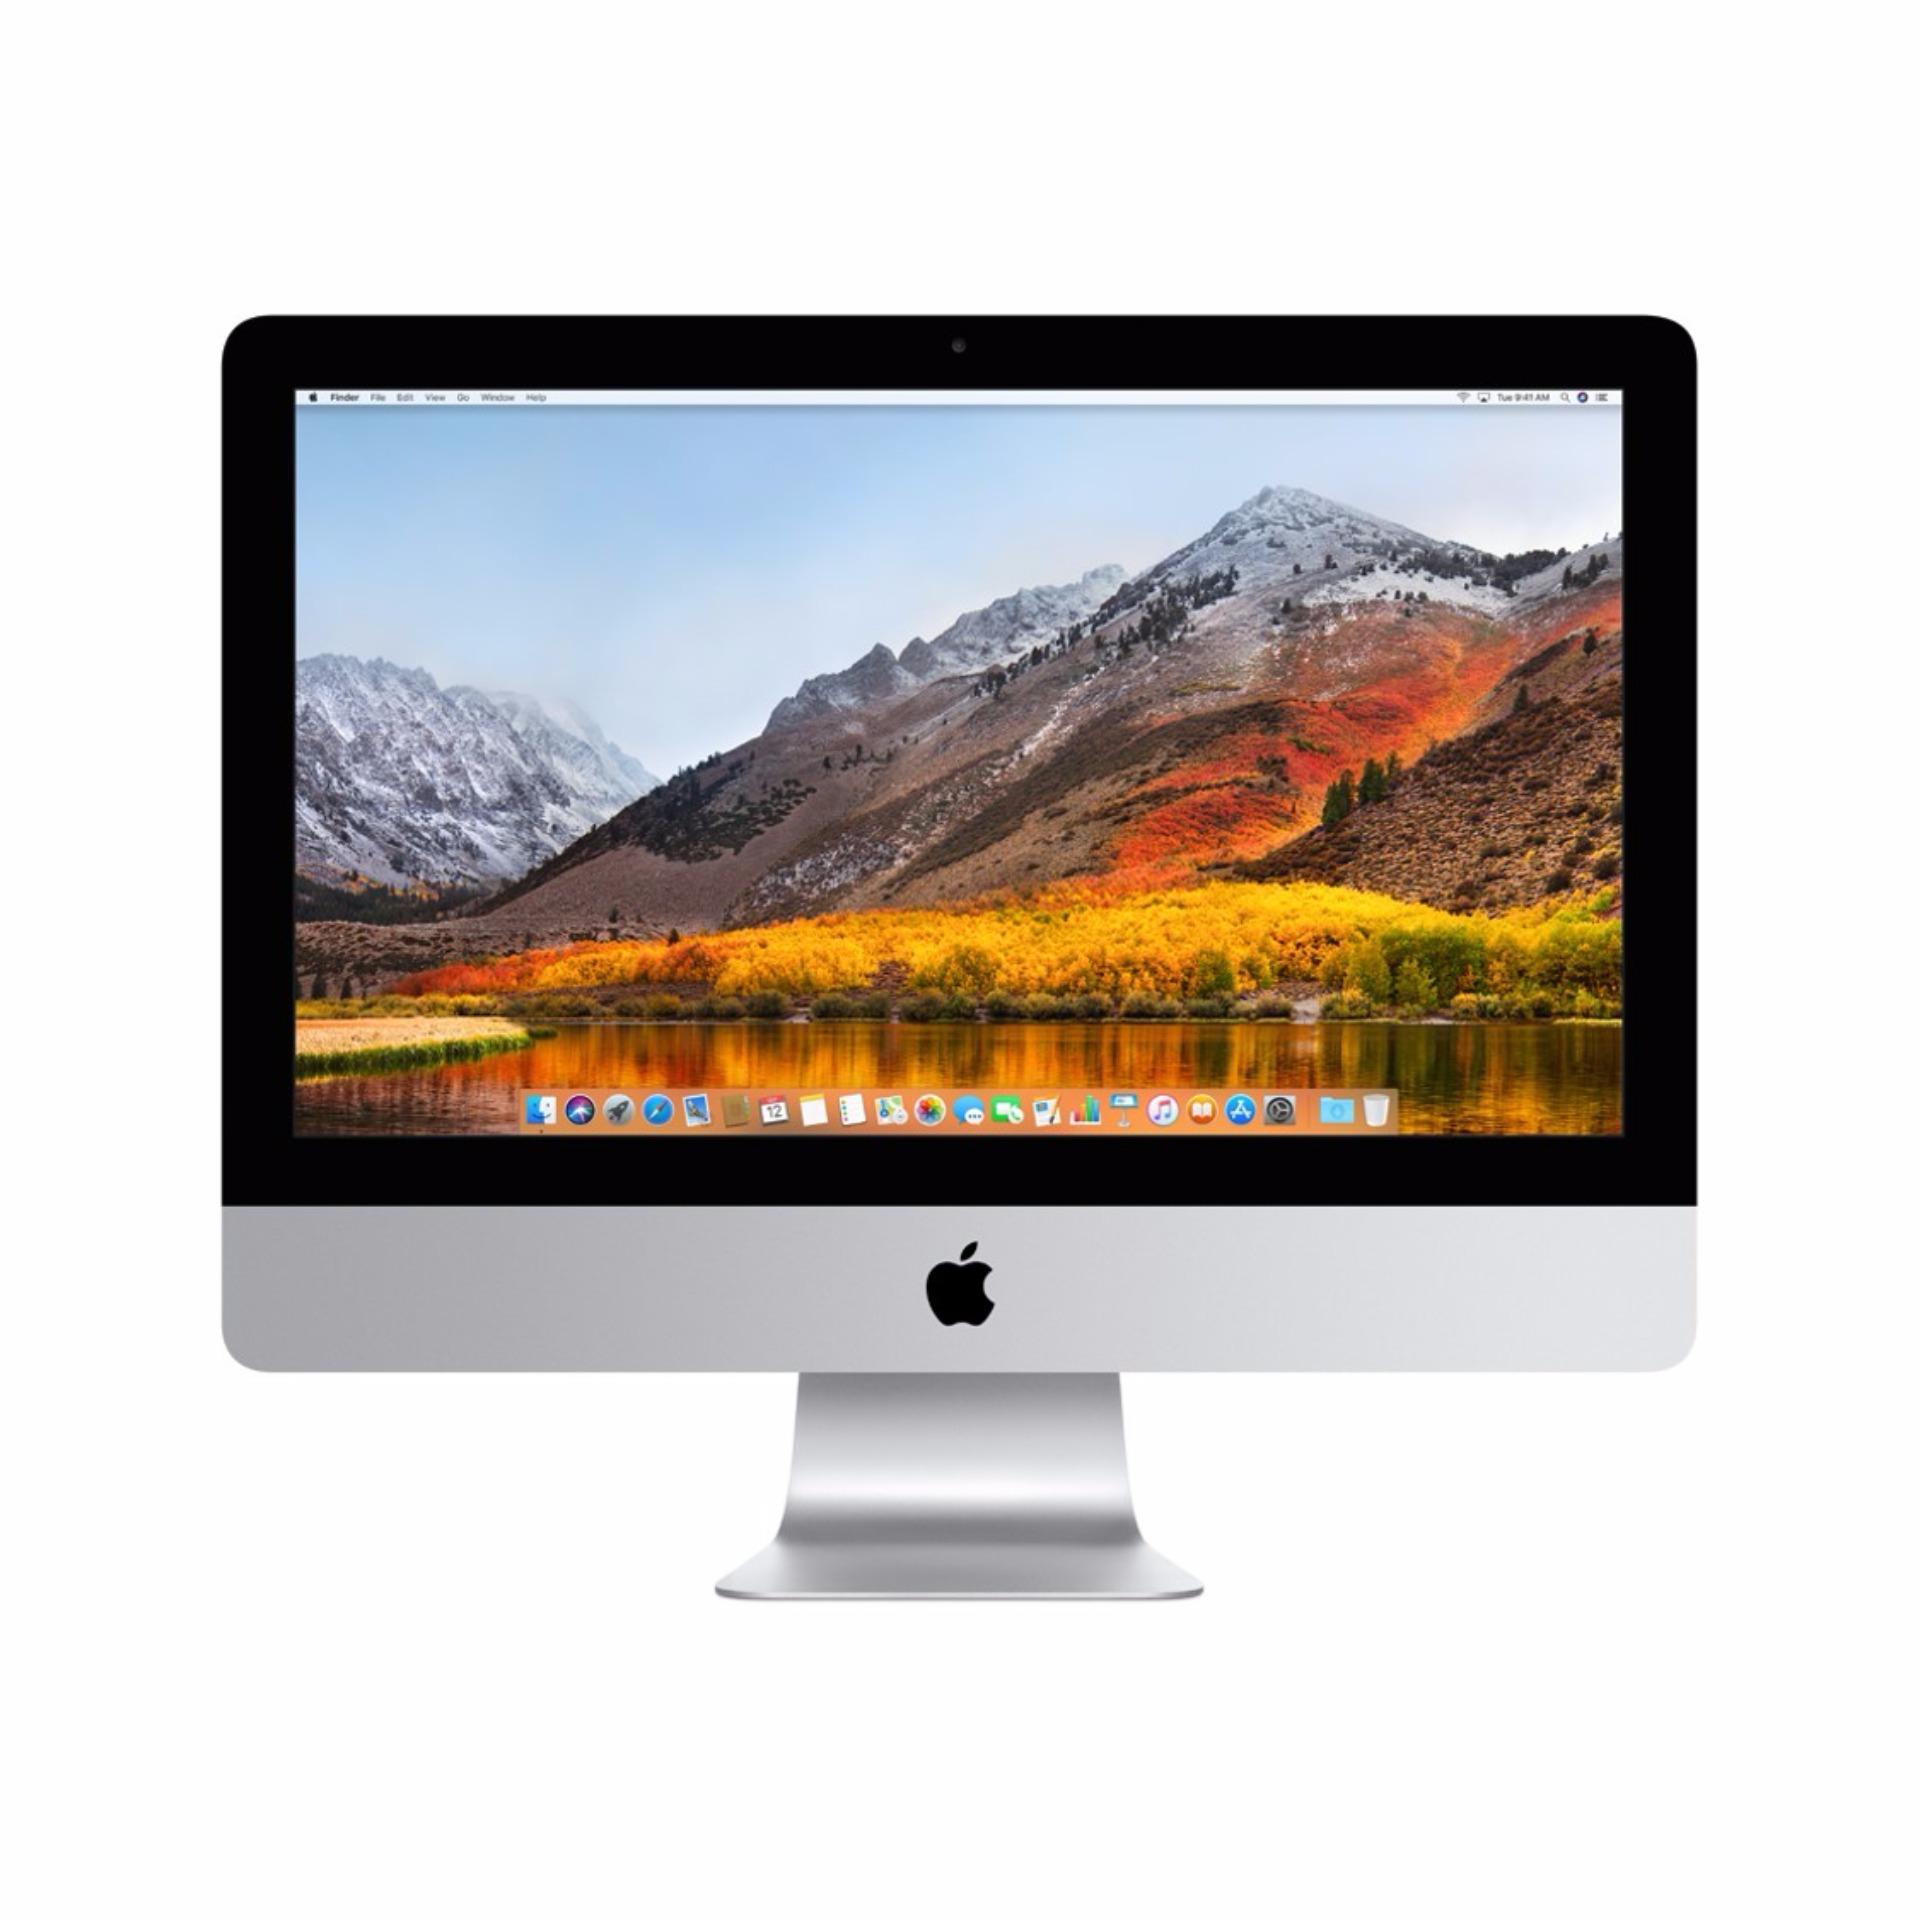 Apple iMac 21.5-inch with Retina 4K display: 3.0GHz quad-core Intel Core i5